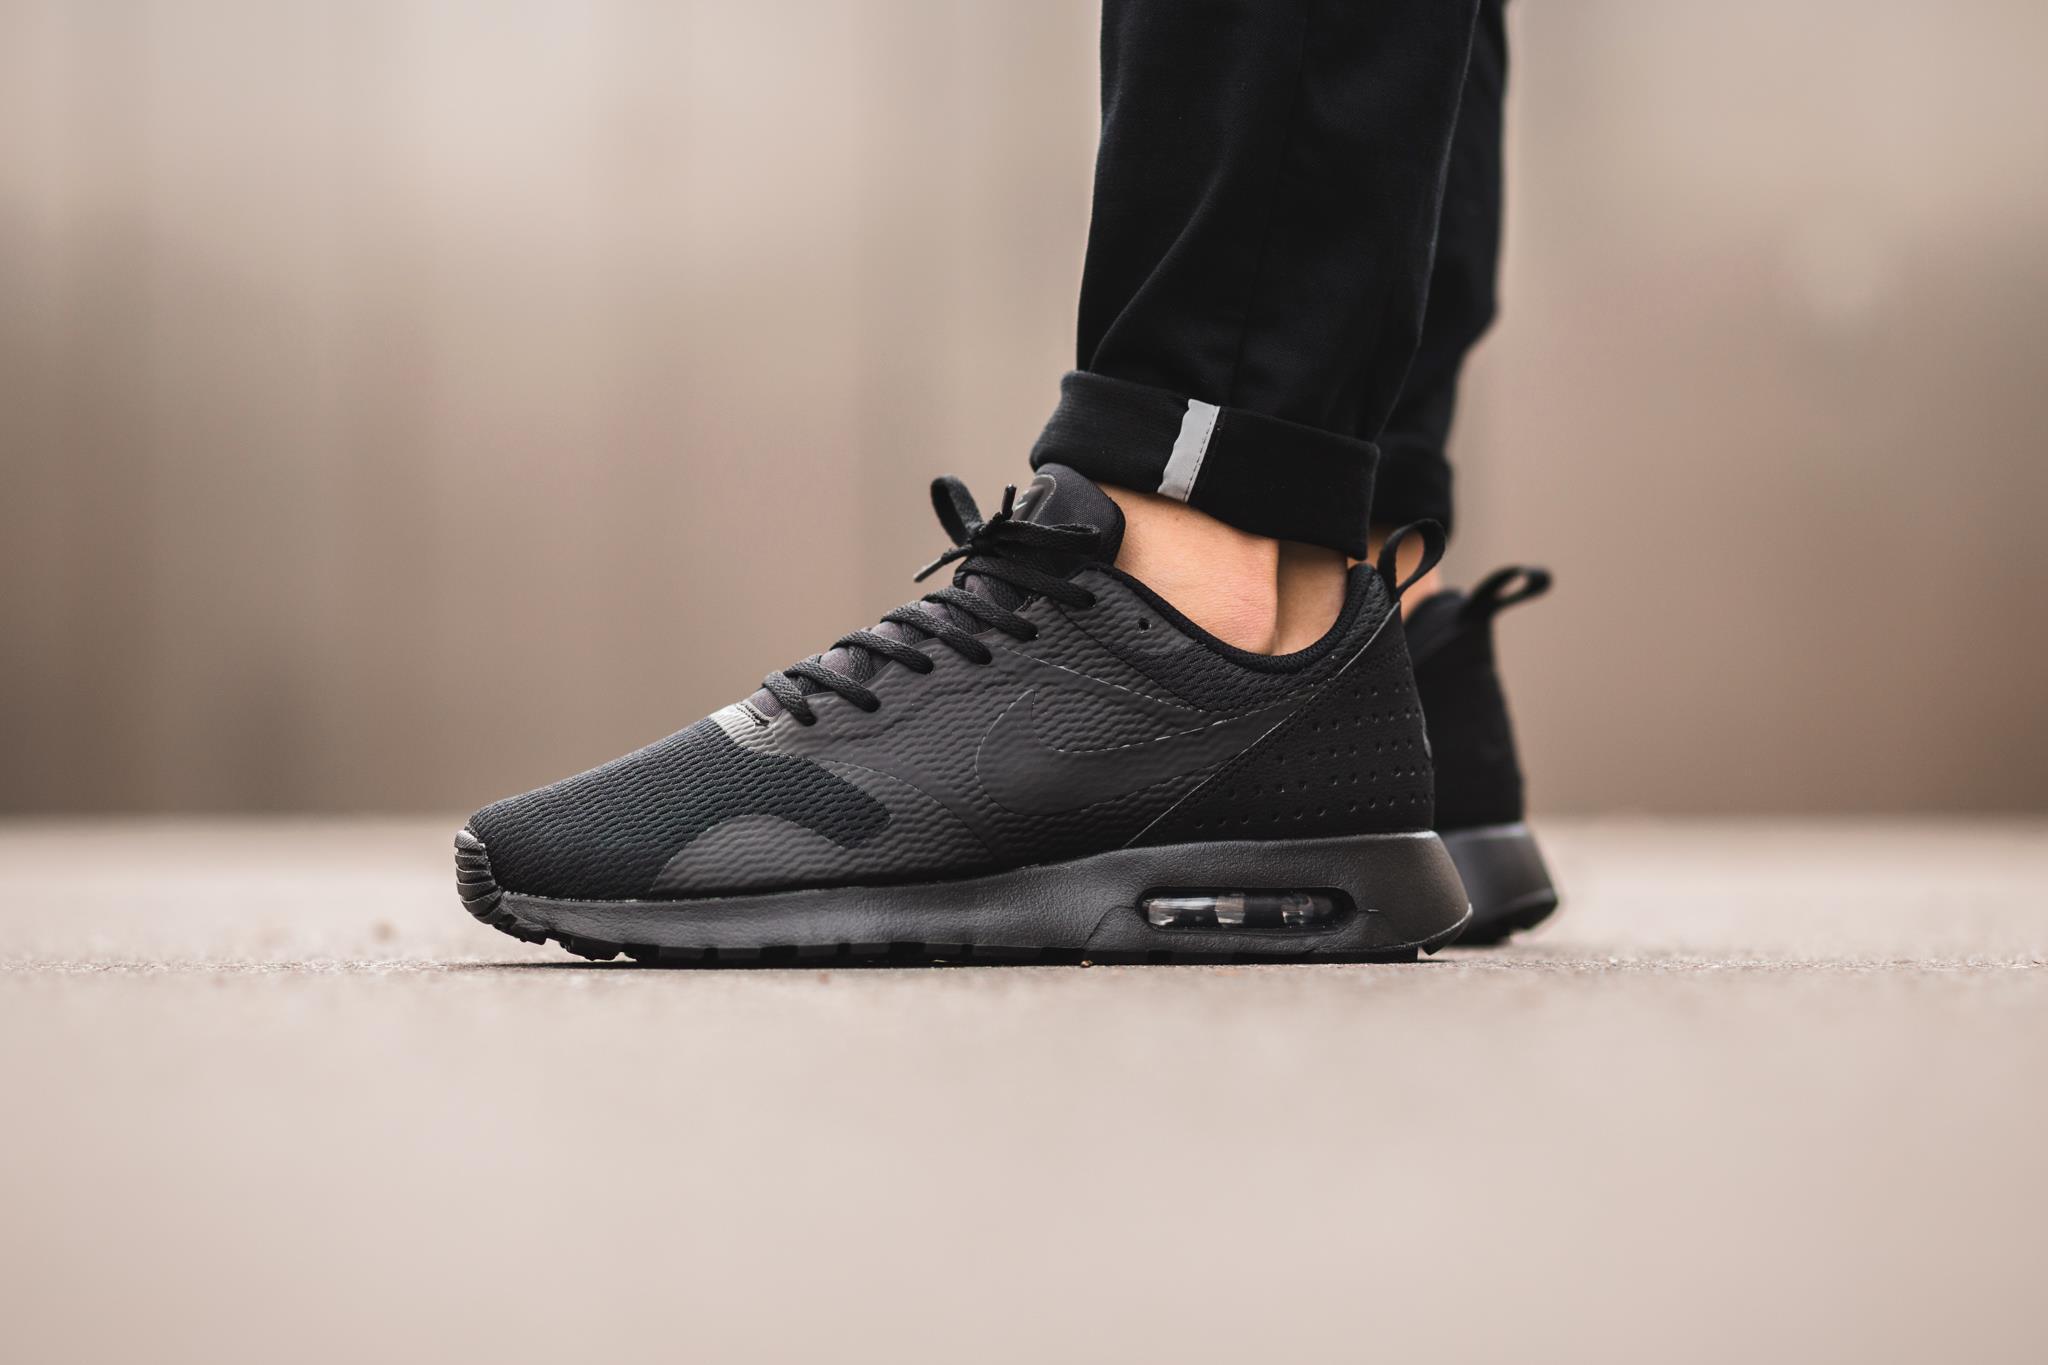 bf5f2e05a18 Another Stealthy Nike Air Max Tavas • KicksOnFire.com